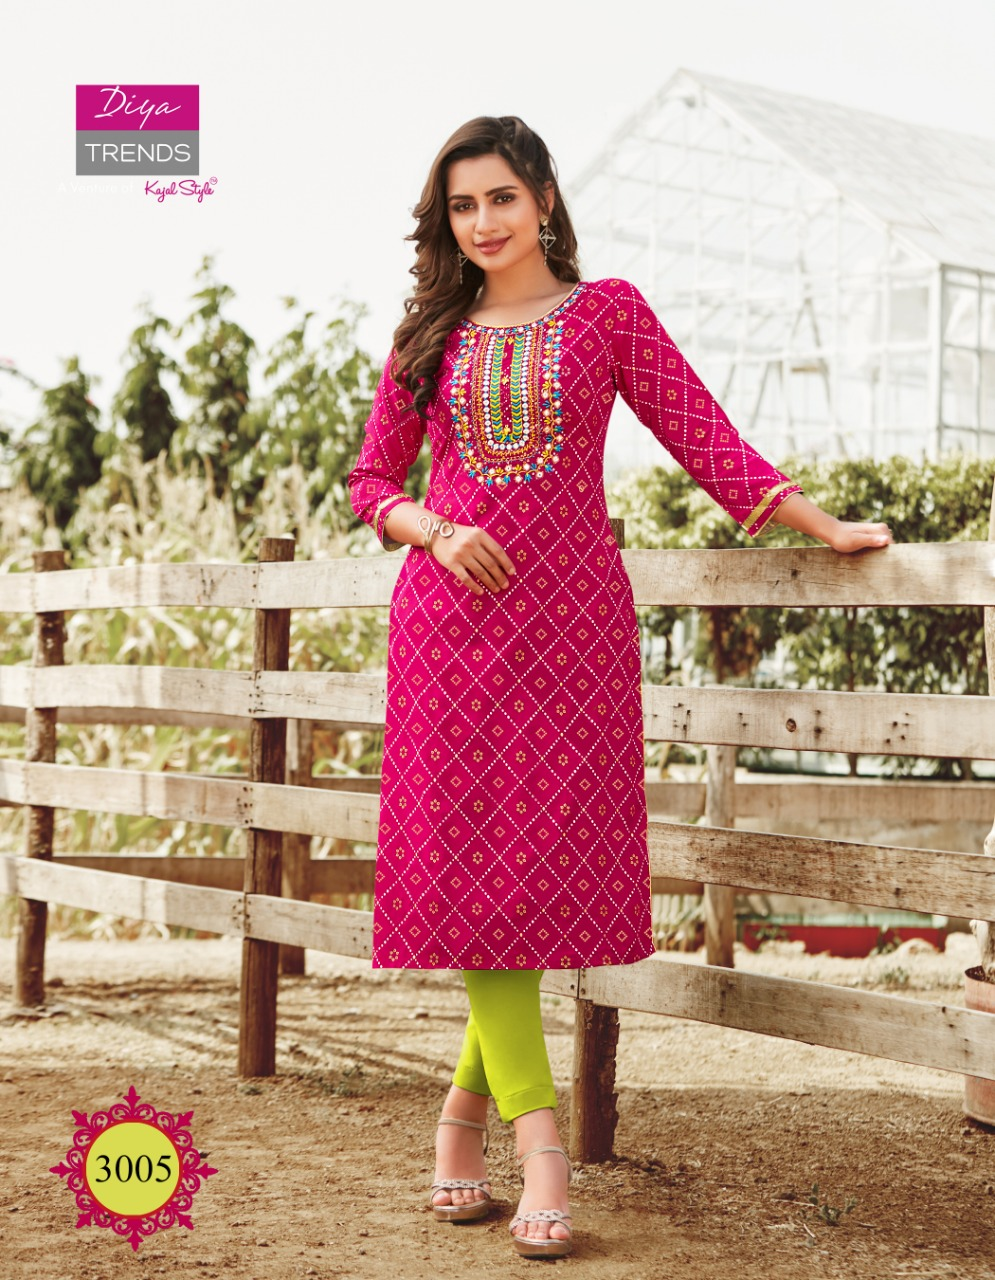 Diya Trends Victoria Vol 3 by Kajal Style Kurti Wholesale Catalog 12 Pcs 5 - Diya Trends Victoria Vol 3 by Kajal Style Kurti Wholesale Catalog 12 Pcs